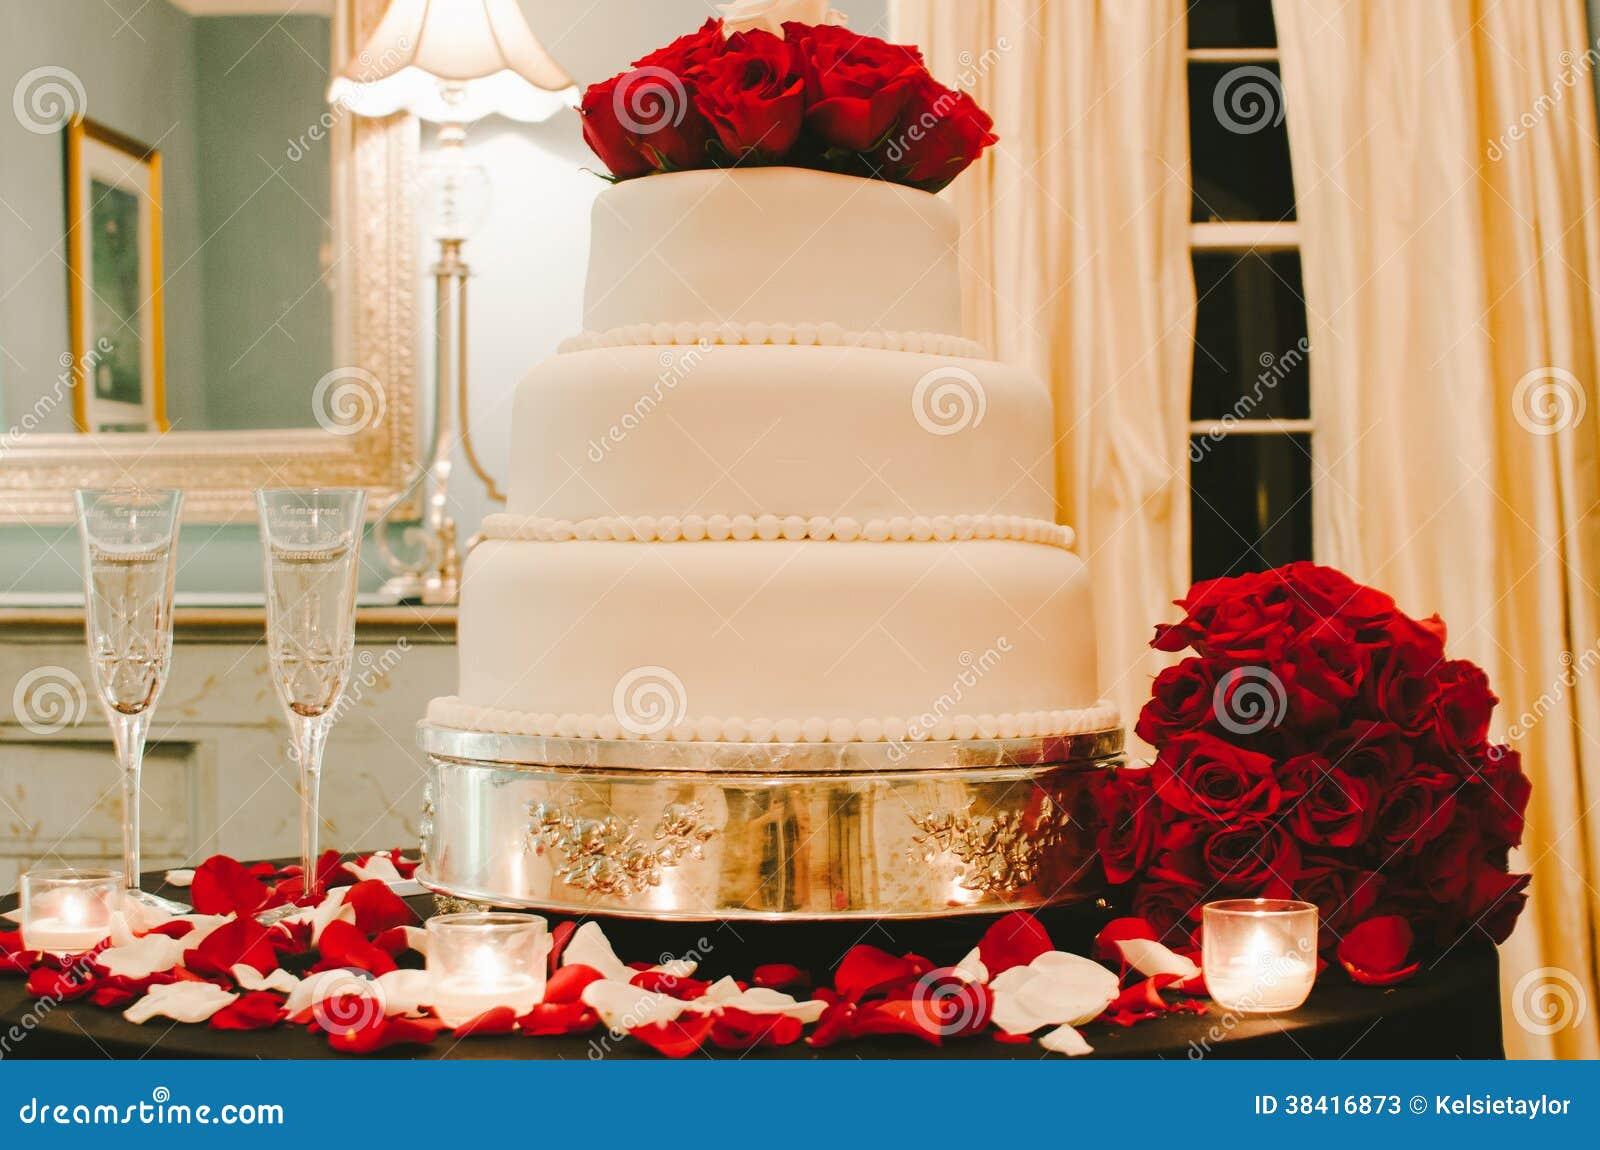 White Wedding Cake With Red Roses Stock Image - Image of white ...